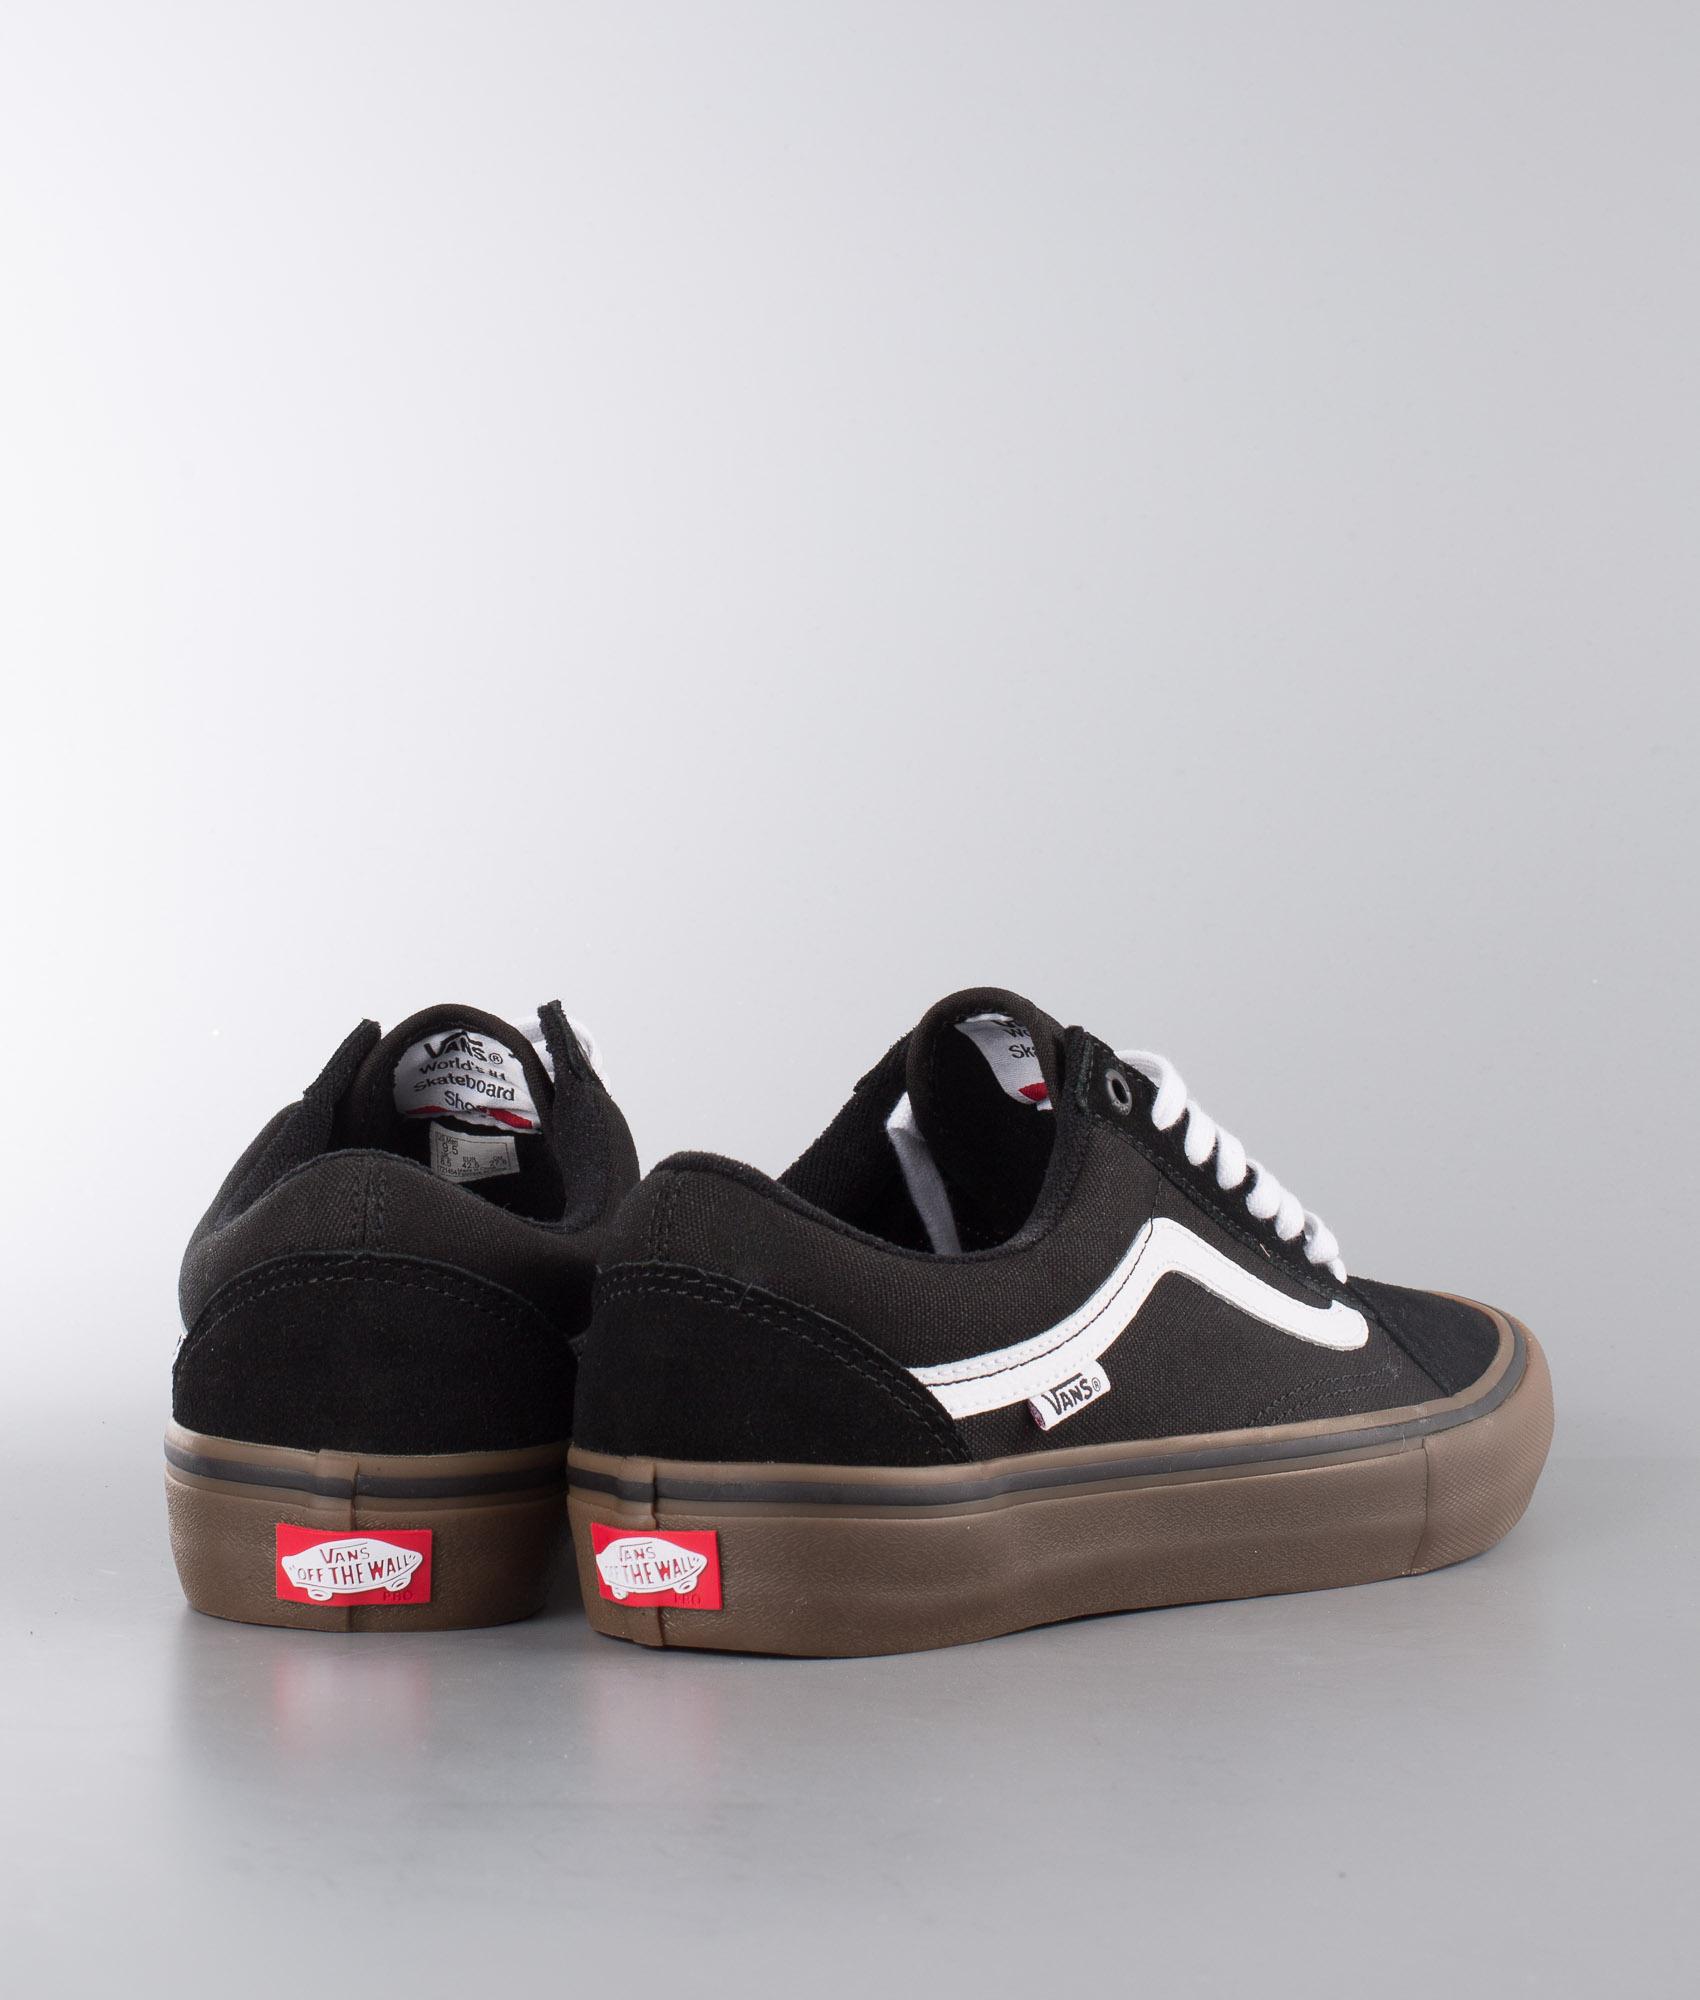 Gum Blackwhitemedium Vans Old Pro Skool Shoes xAwSq46